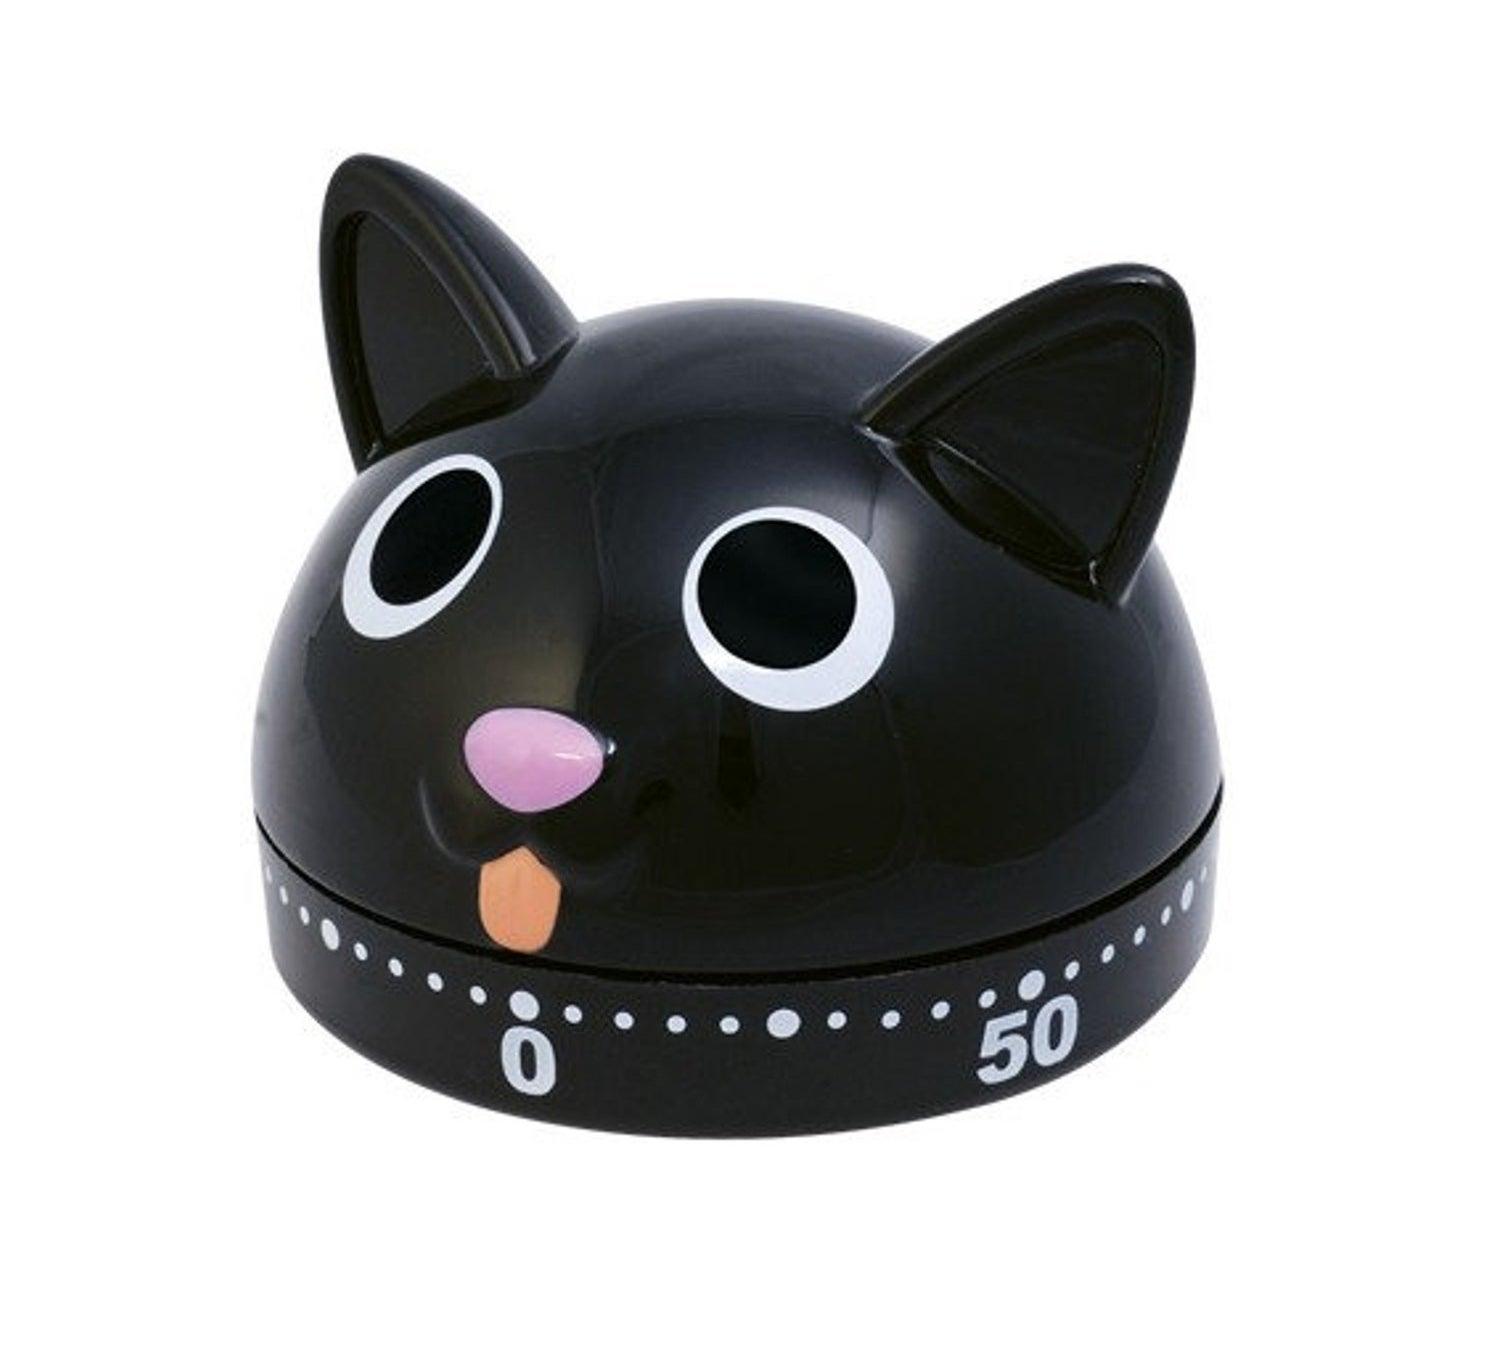 a black cat shaped timer